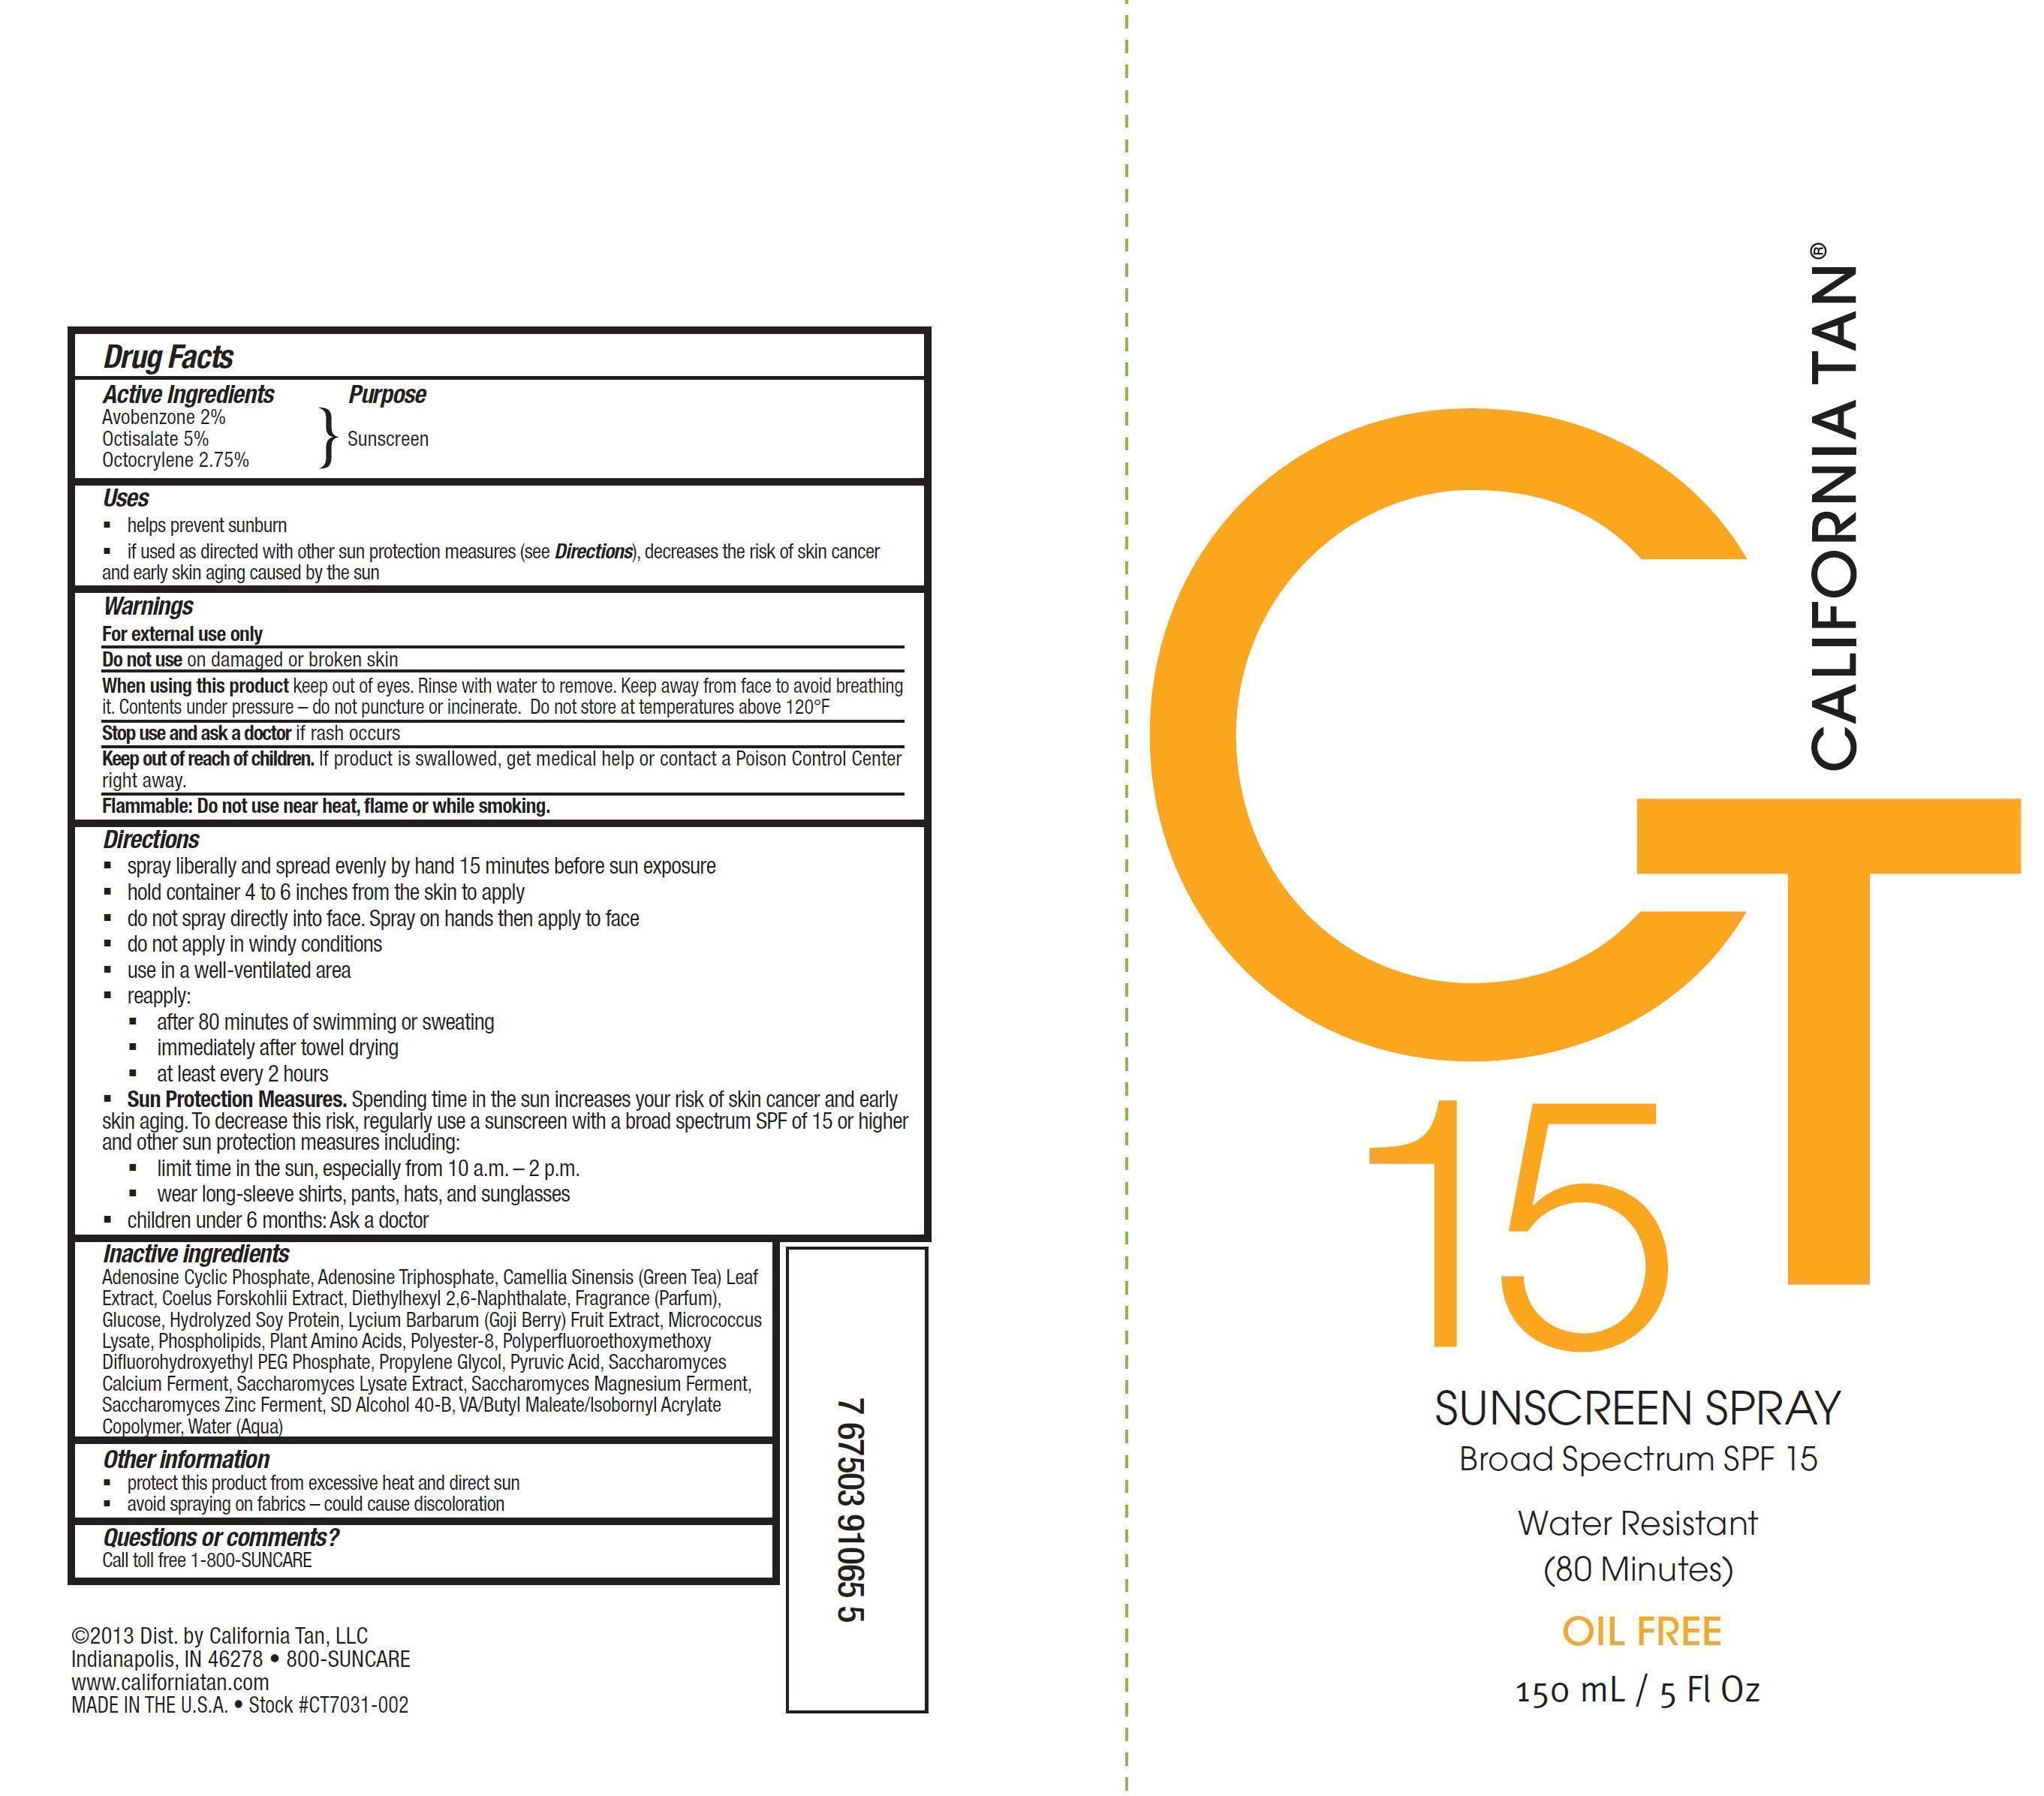 California Tan Broad Spectrum Spf 15 (Avobenzone, Octisalate And Octocrylene) Spray [Prime Packaging, Inc.]